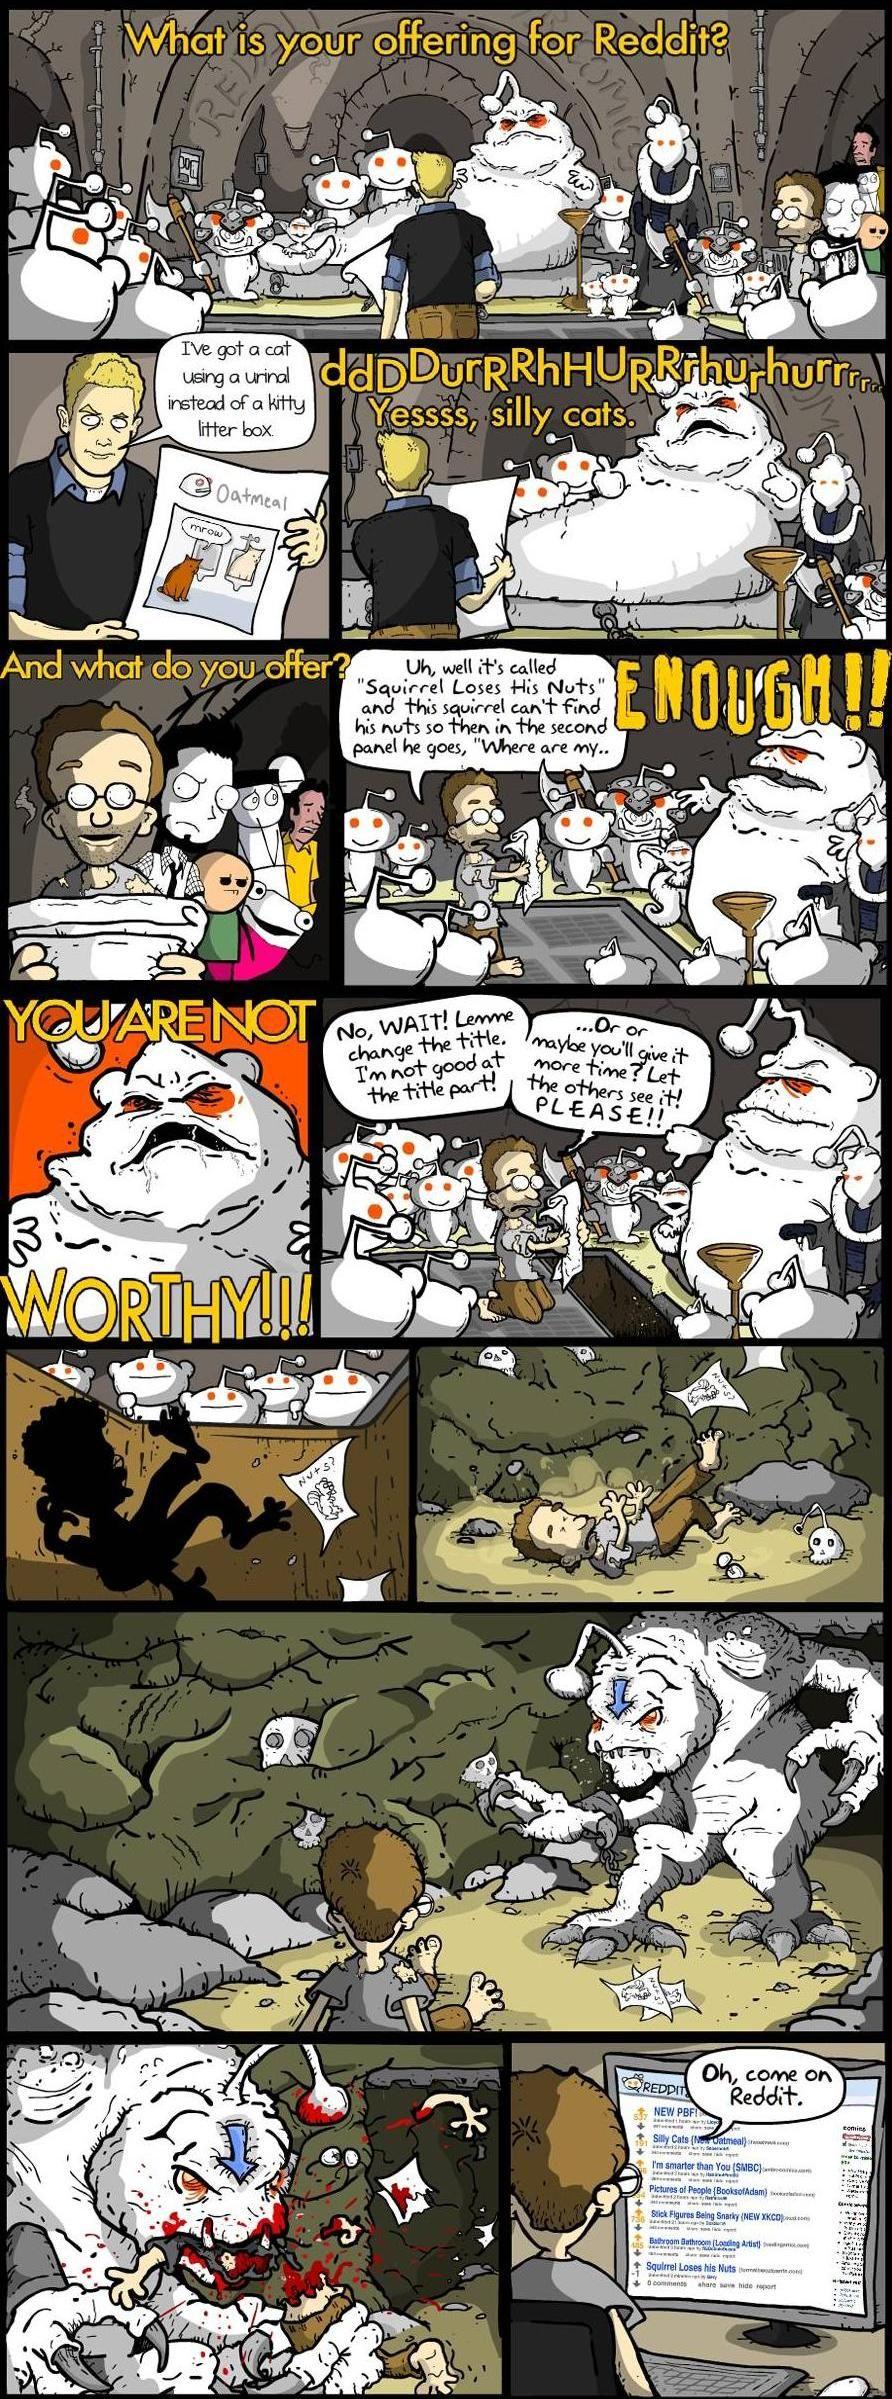 Offering for Reddit | Funny | Funny, Funny images, Comic strips